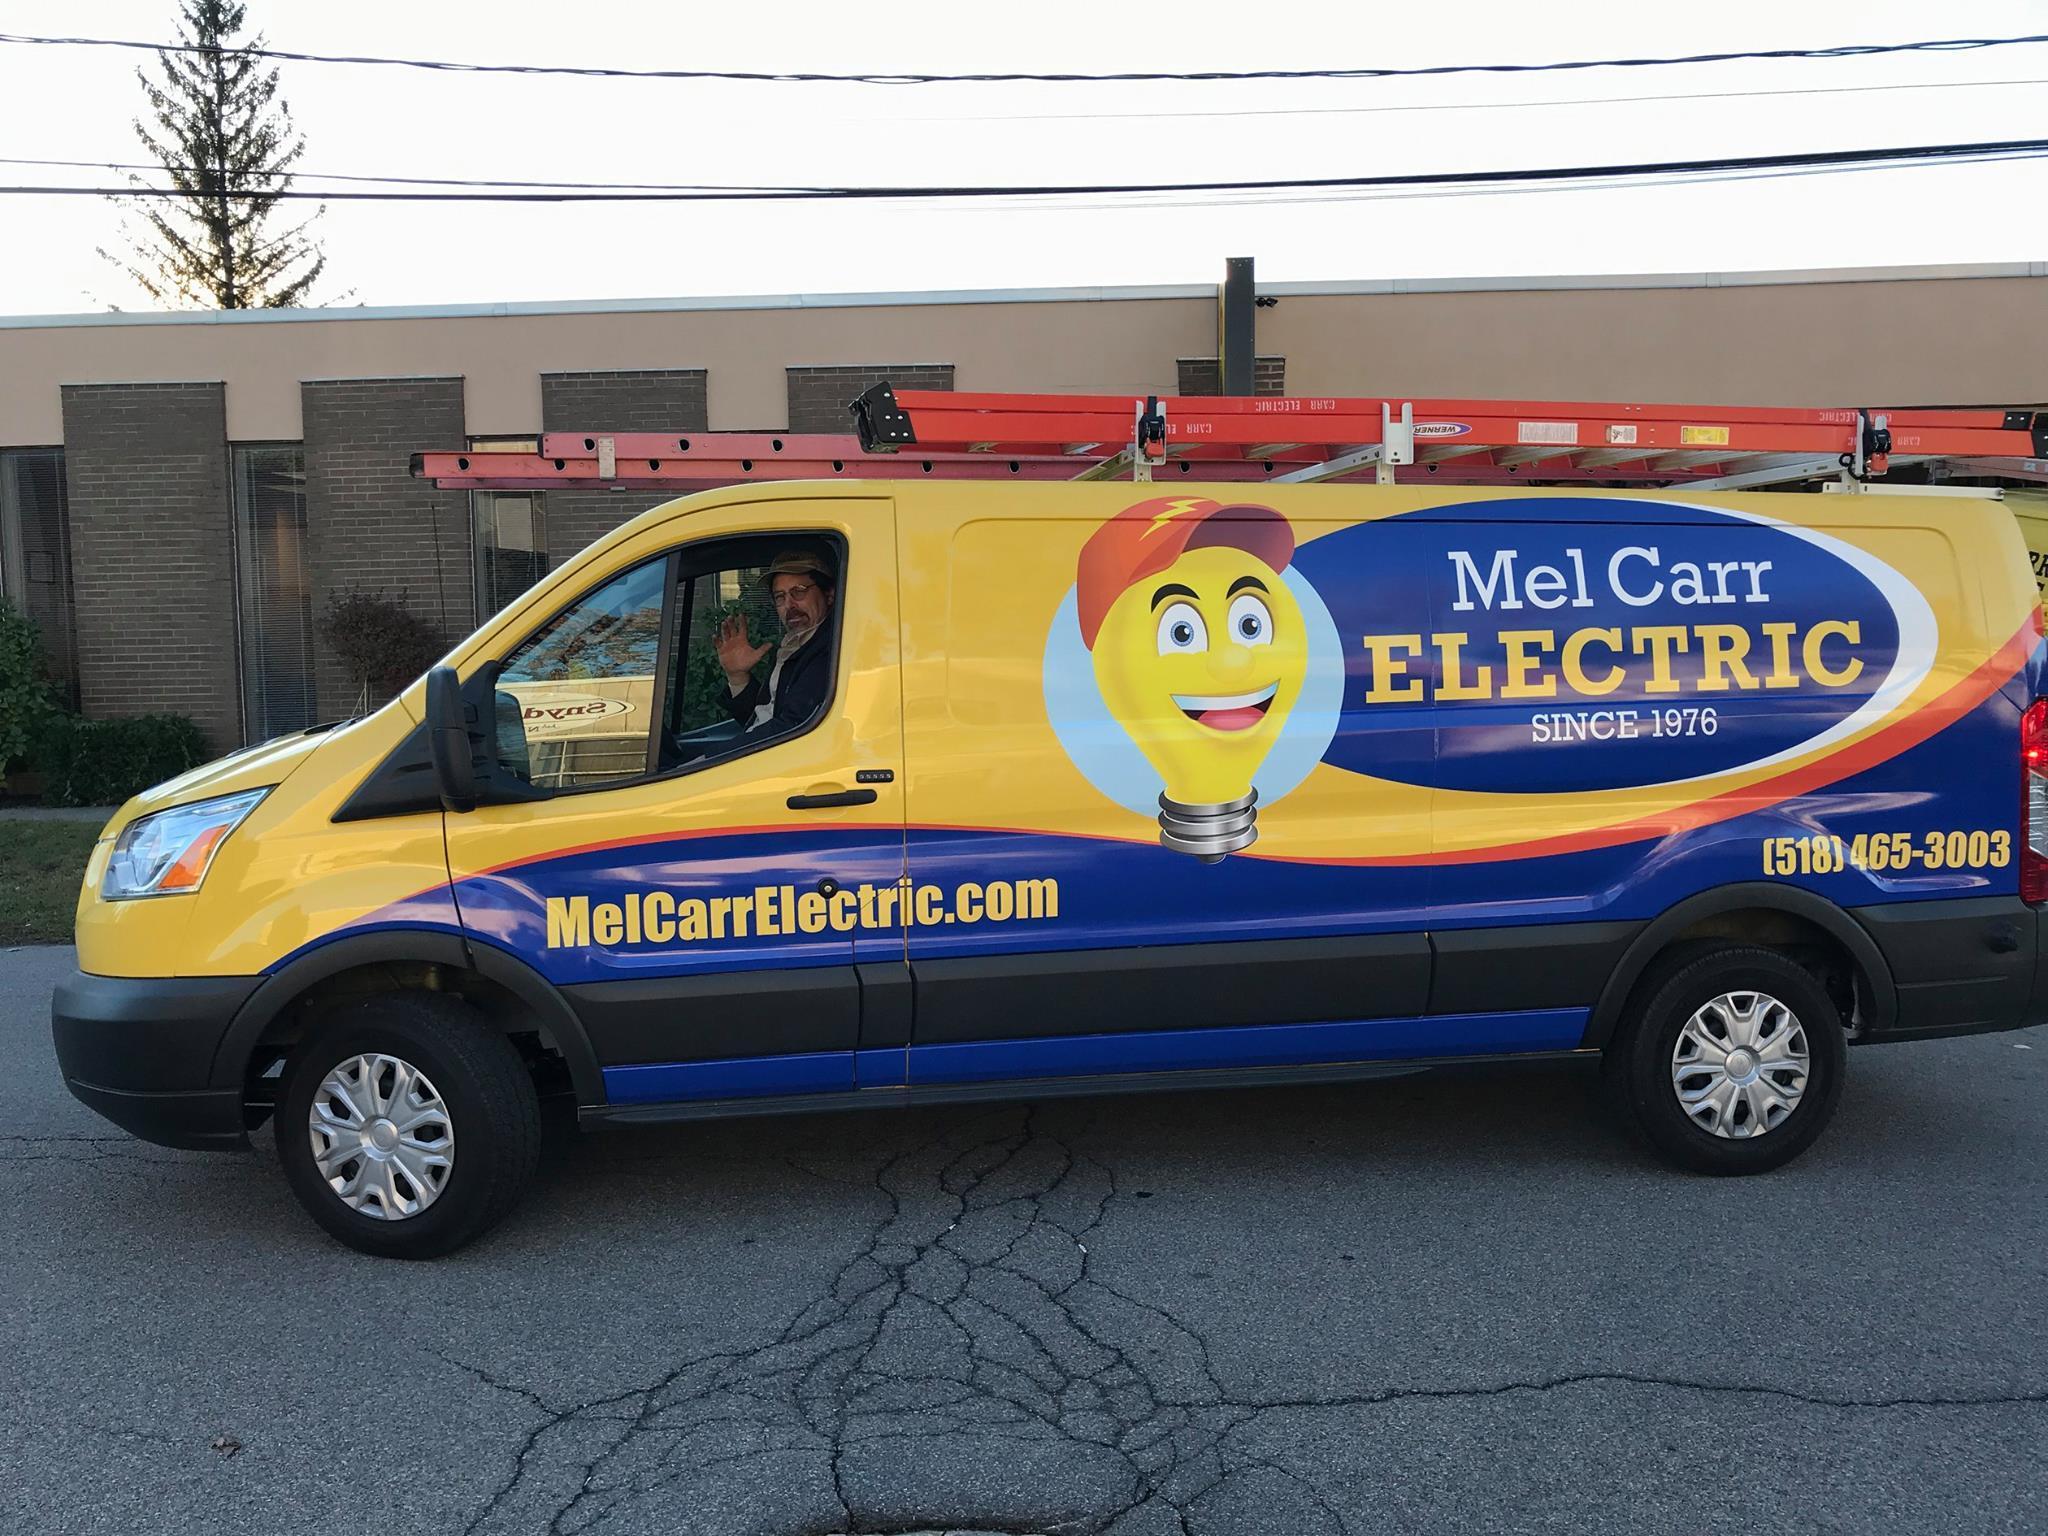 Mel Carr Electric image 7